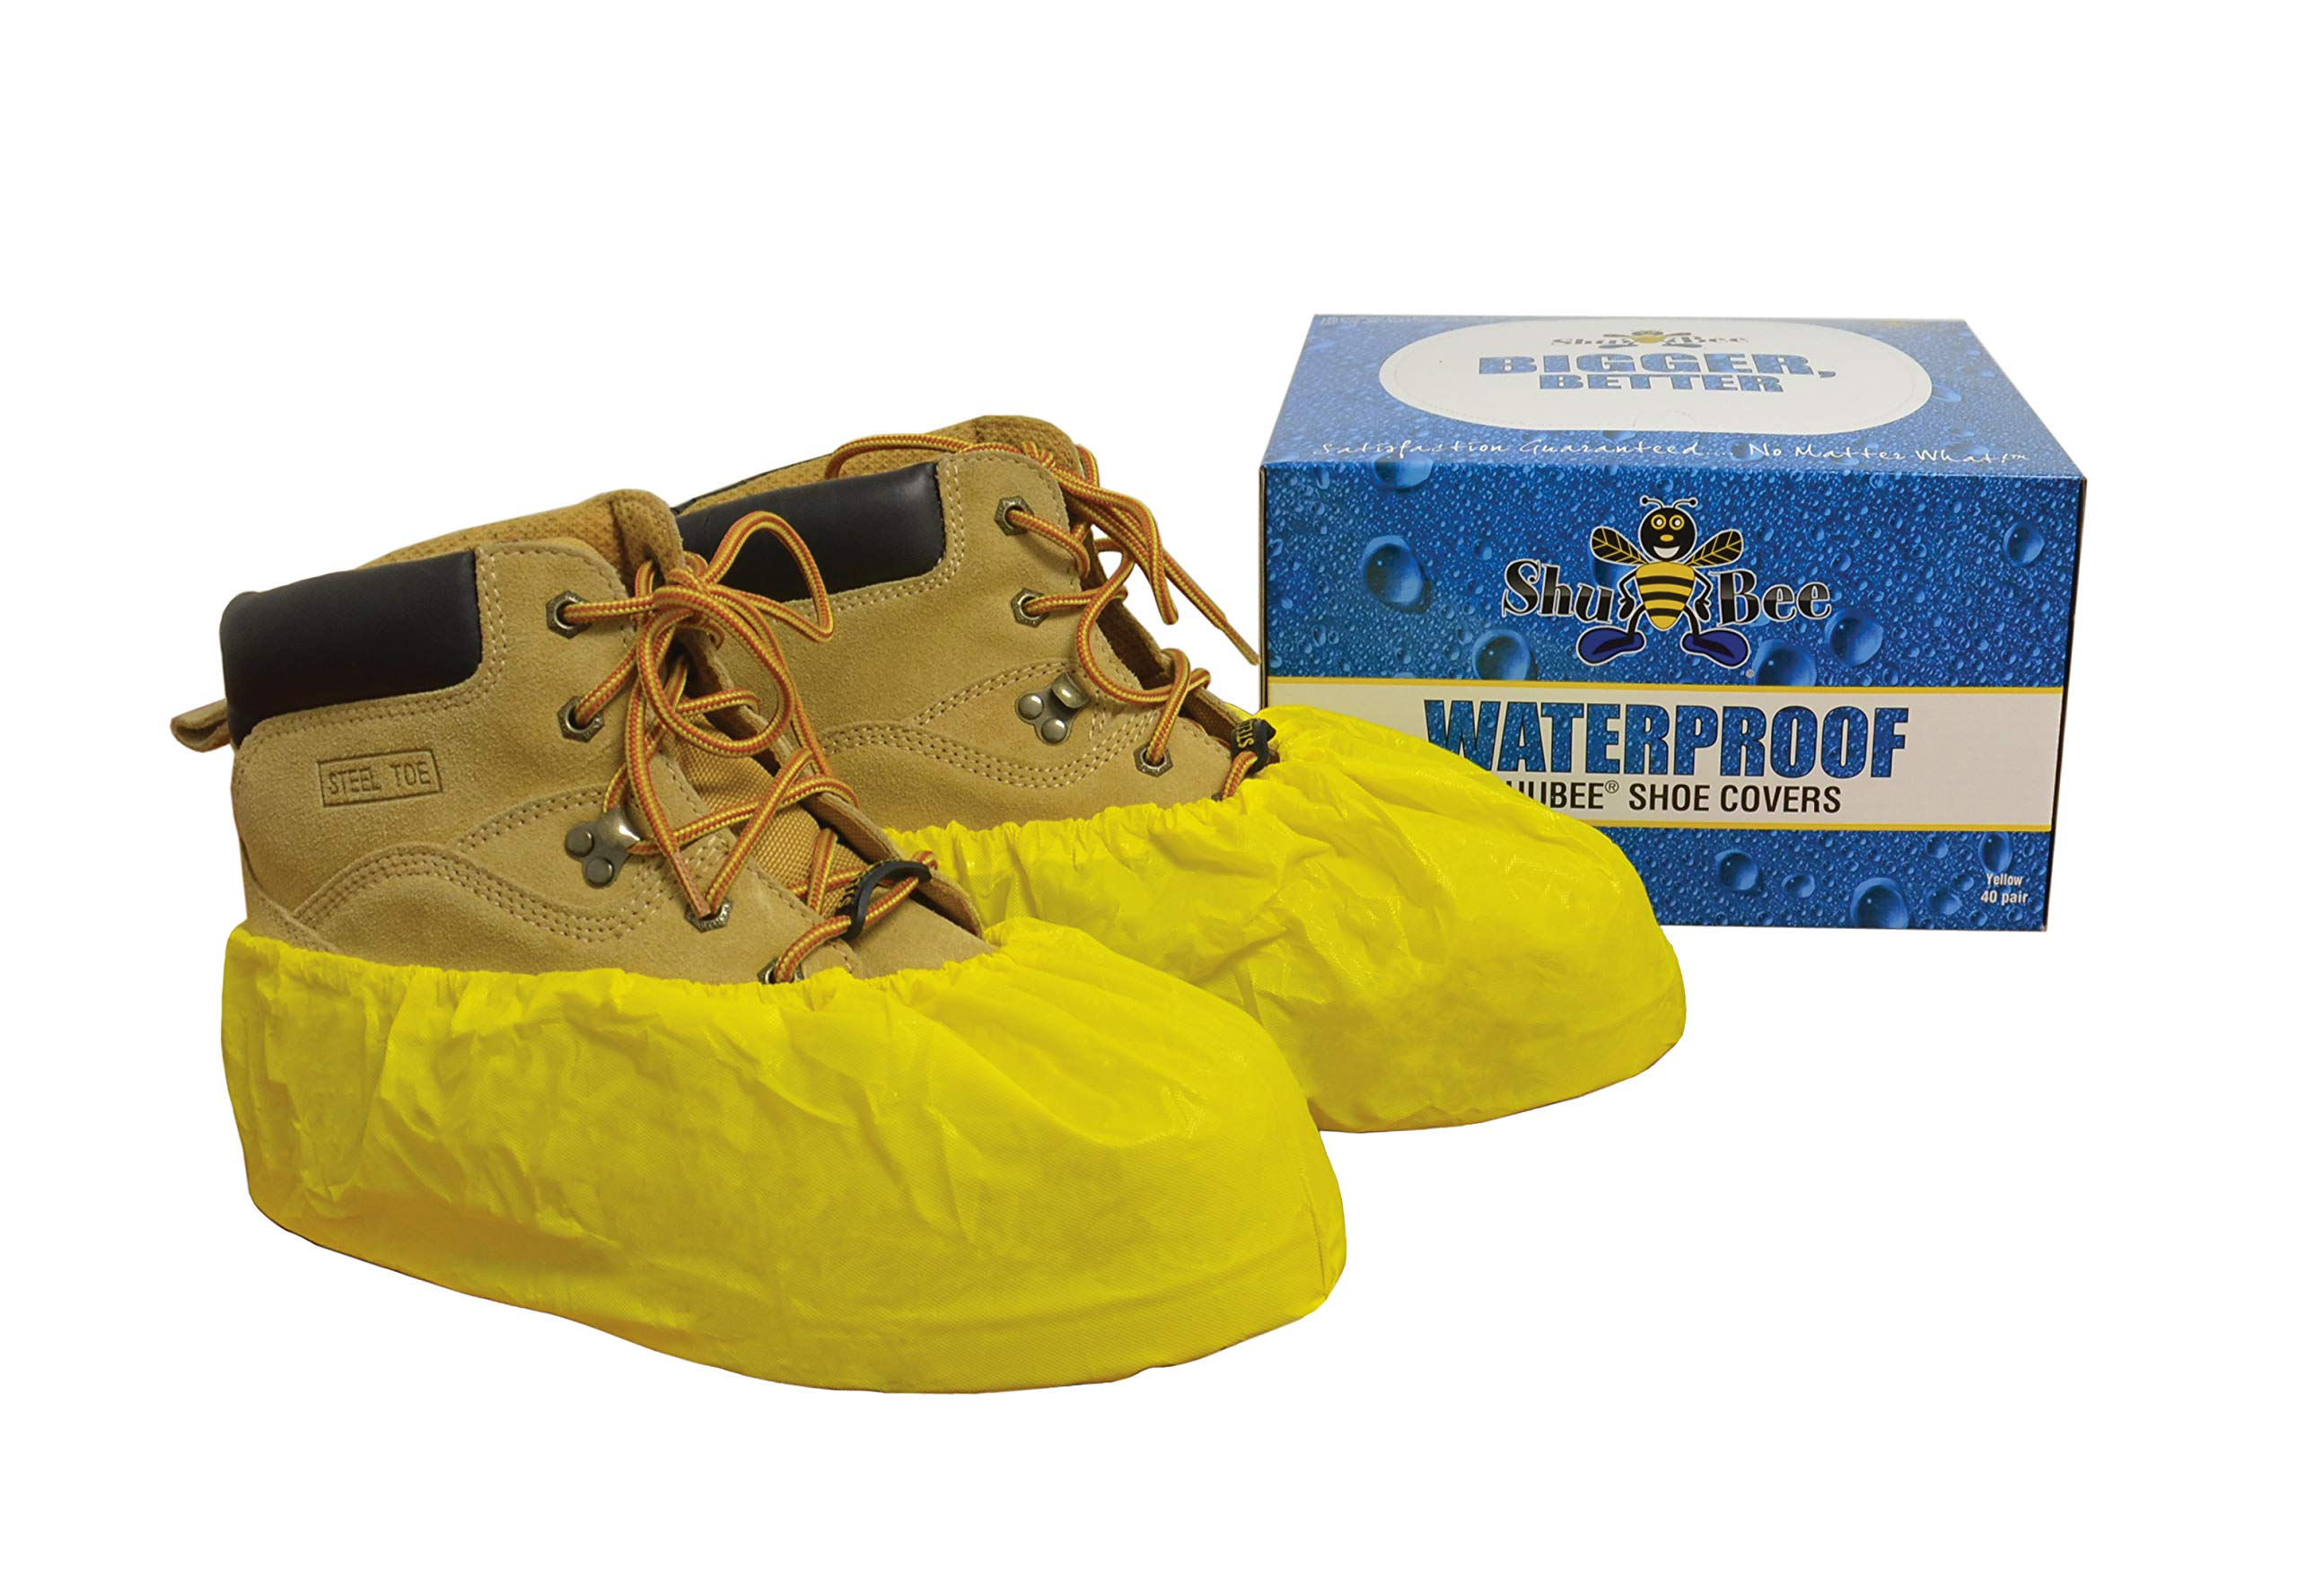 ShuBee Waterproof Shoe Covers, Yellow (40 Pair)